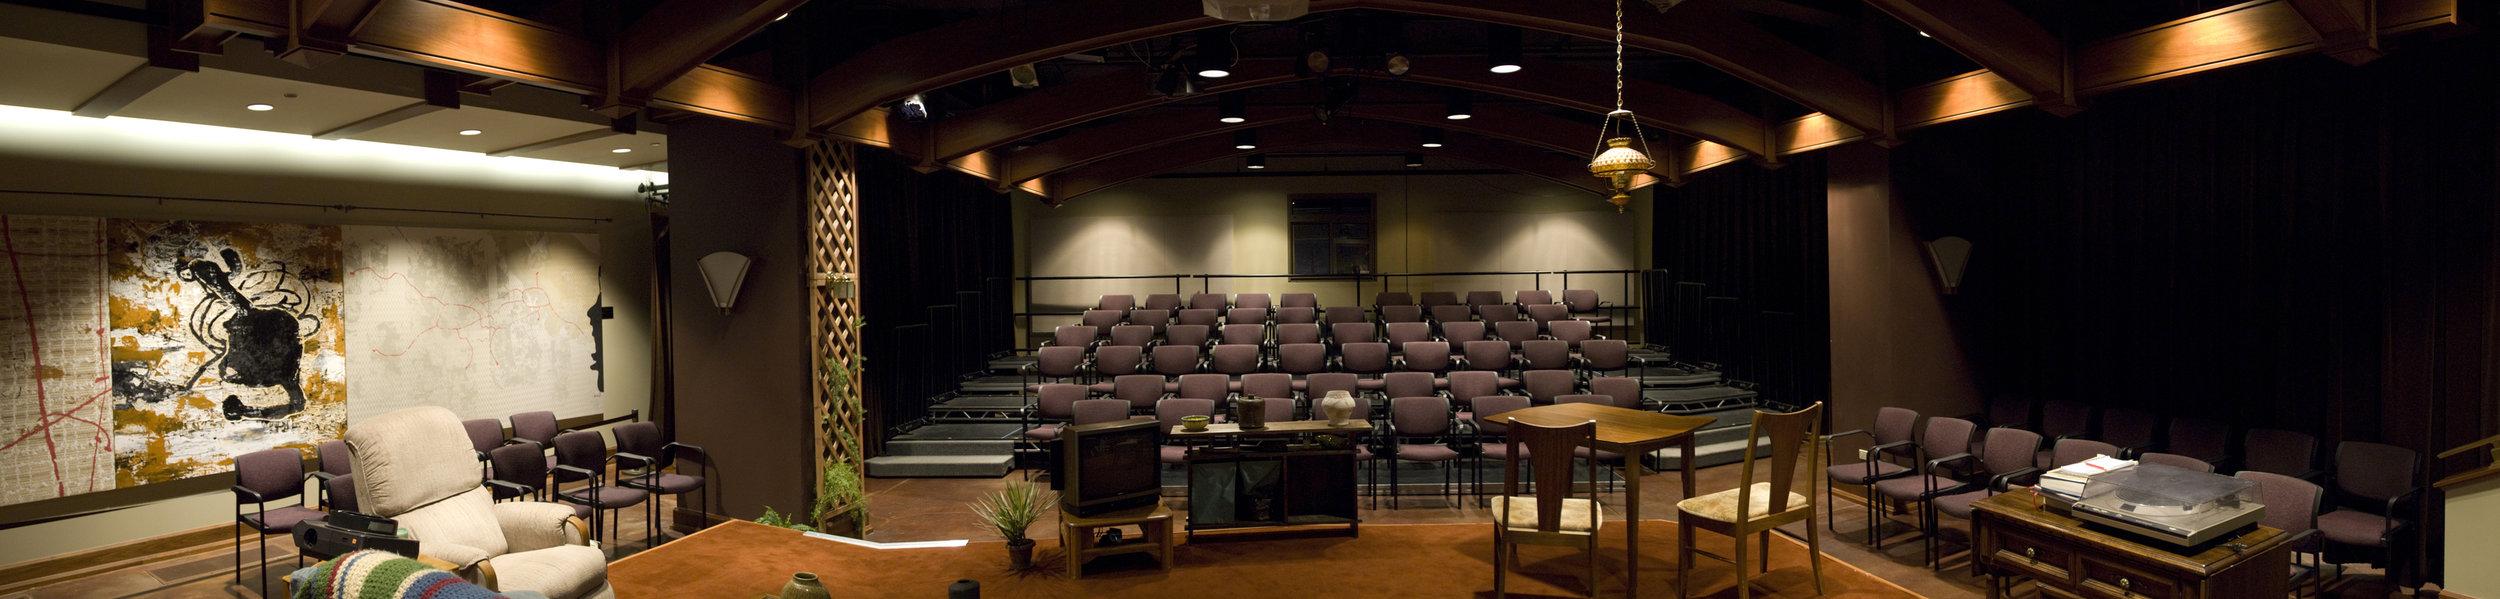 TheaterPanorama.jpg